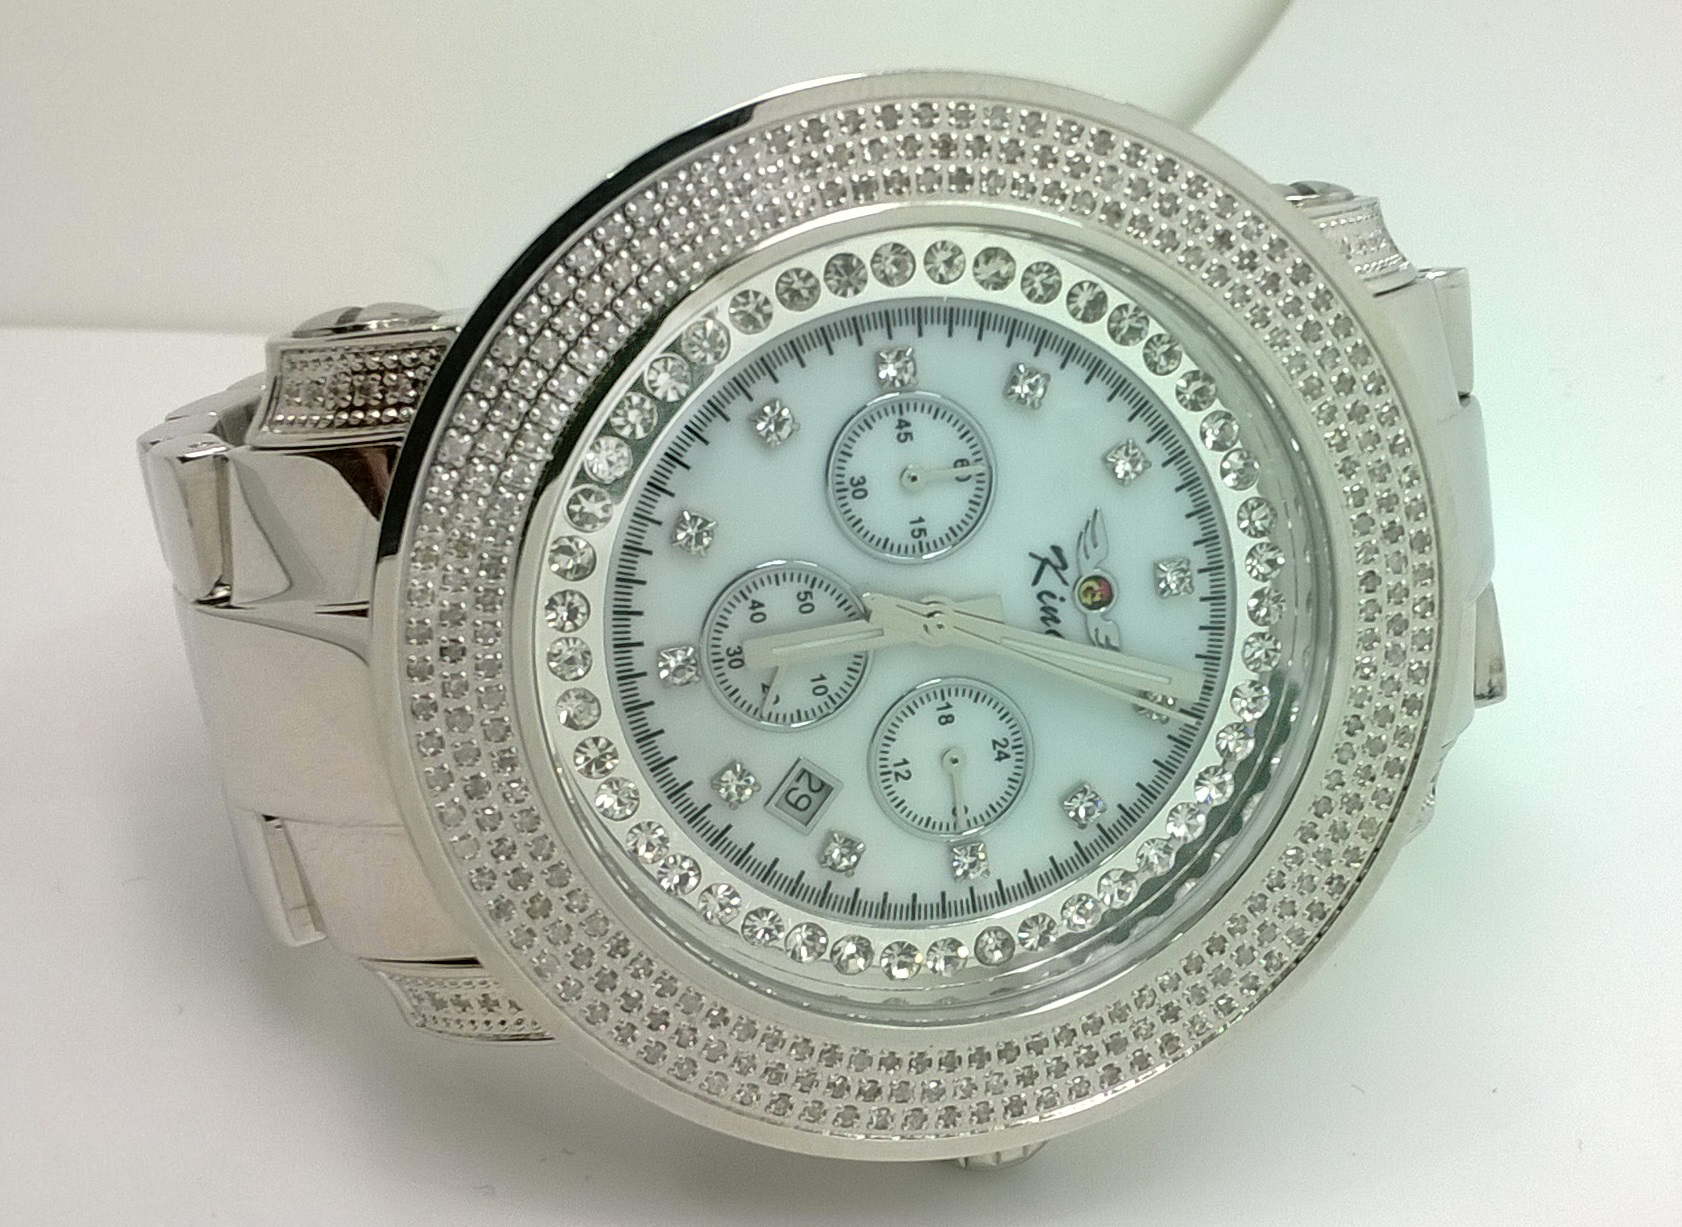 diamond city diamond watches king techno grill diamond watch